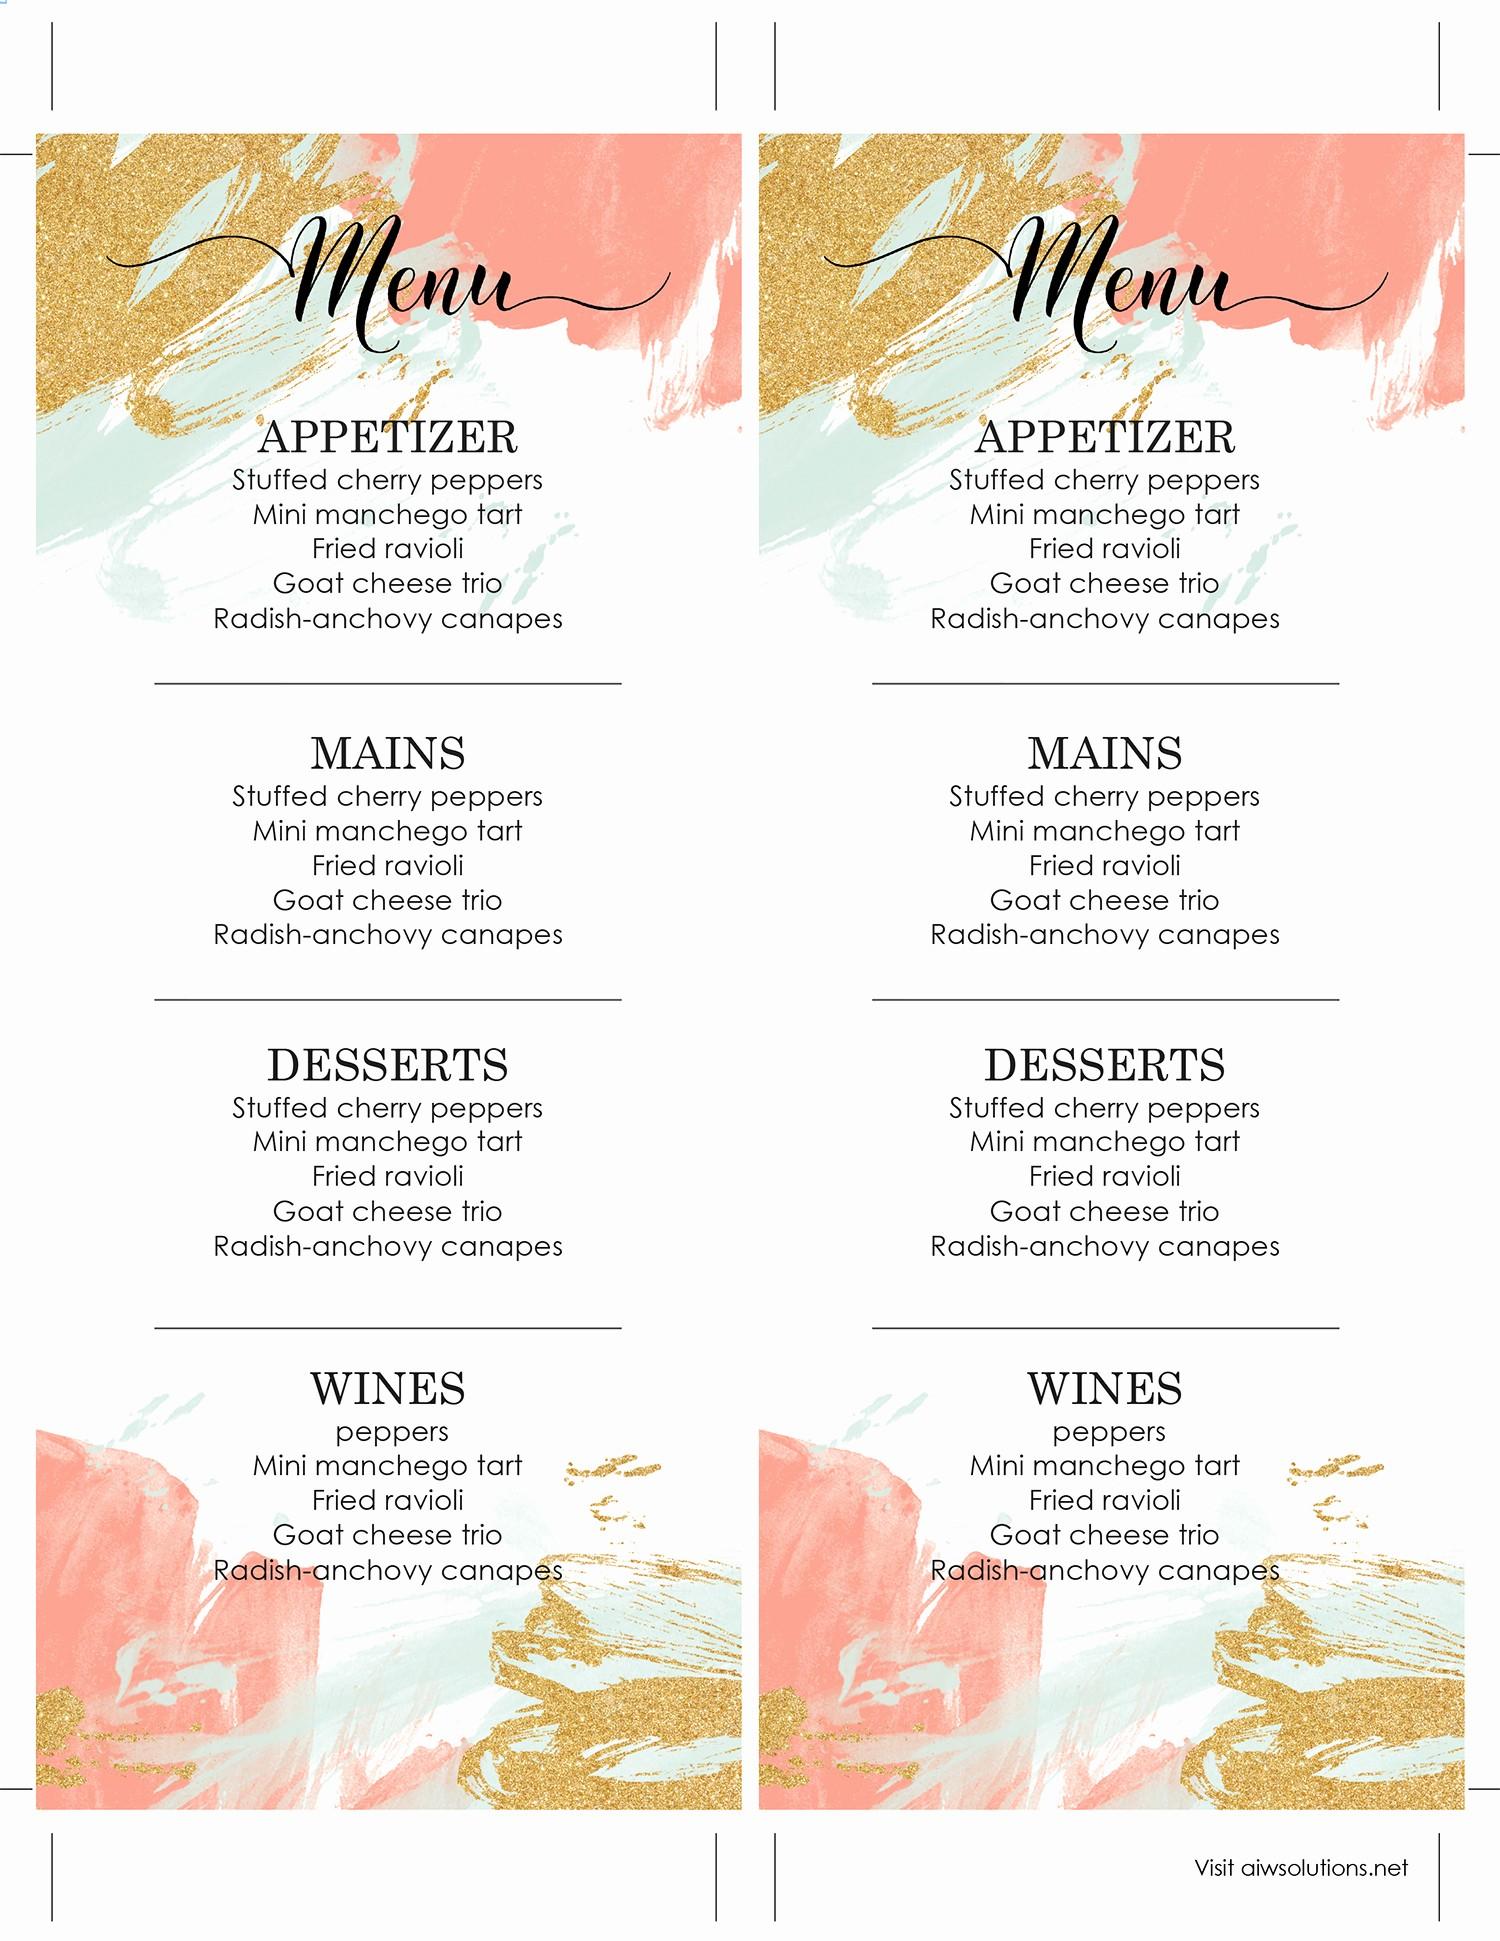 Restaurant Menu Template Microsoft Word Inspirational Design & Templates Menu Templates Wedding Menu Food